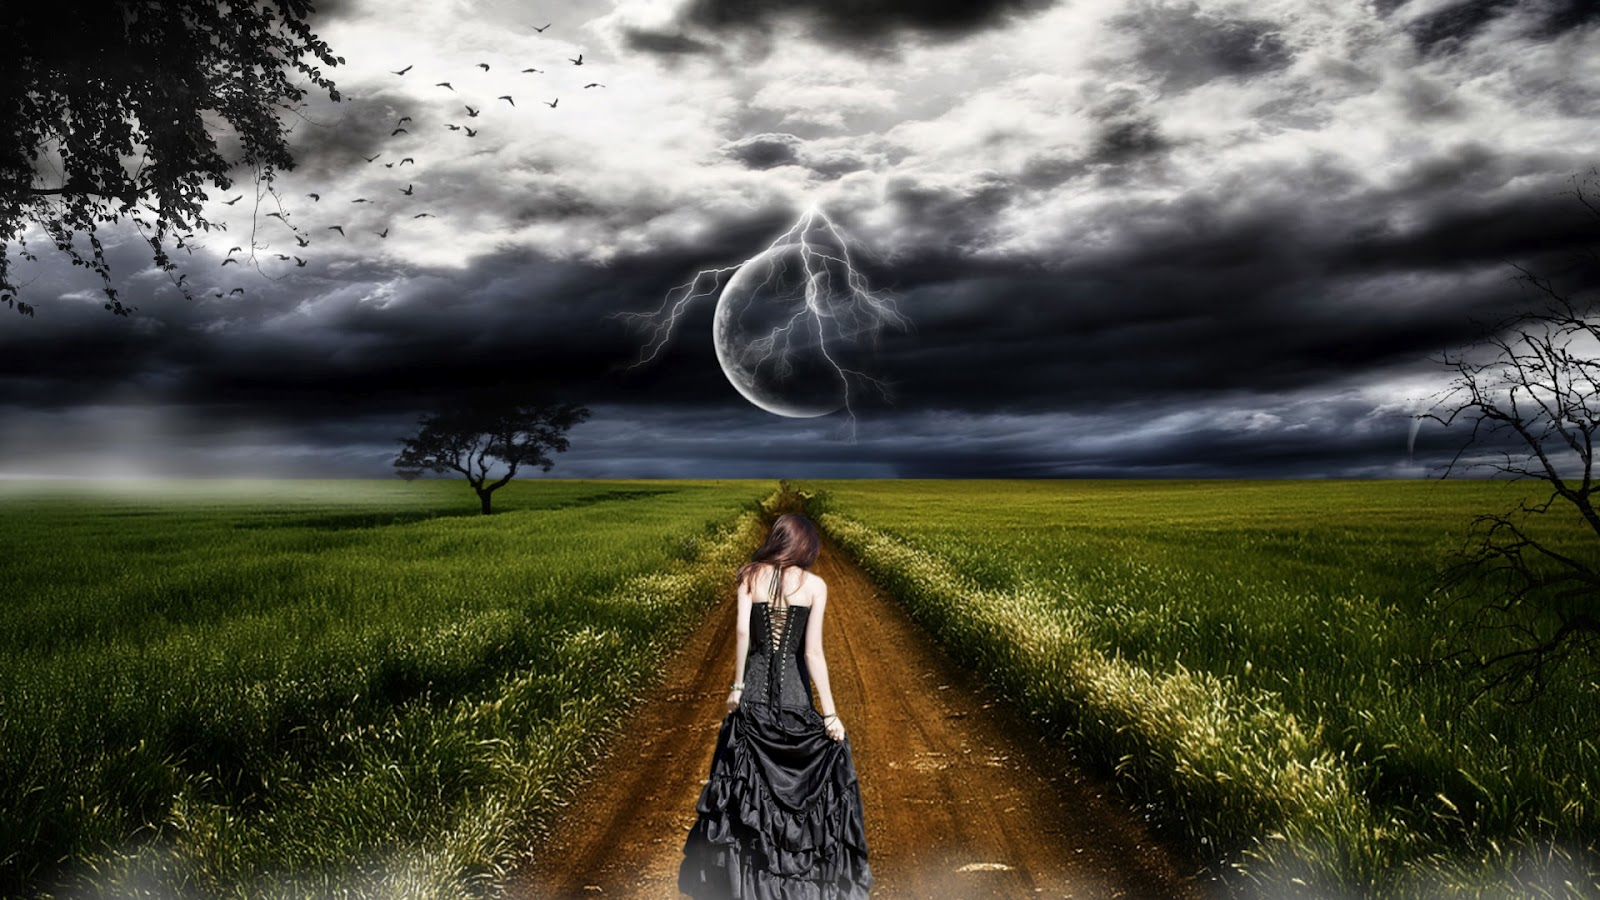 http://2.bp.blogspot.com/-GPOSgyGTJfc/UCjYxksR9JI/AAAAAAAADGI/CpOUuR8aCjM/s1600/fantasy-girl-lightning-storm-sky-wallpaper-1920x1080.jpg